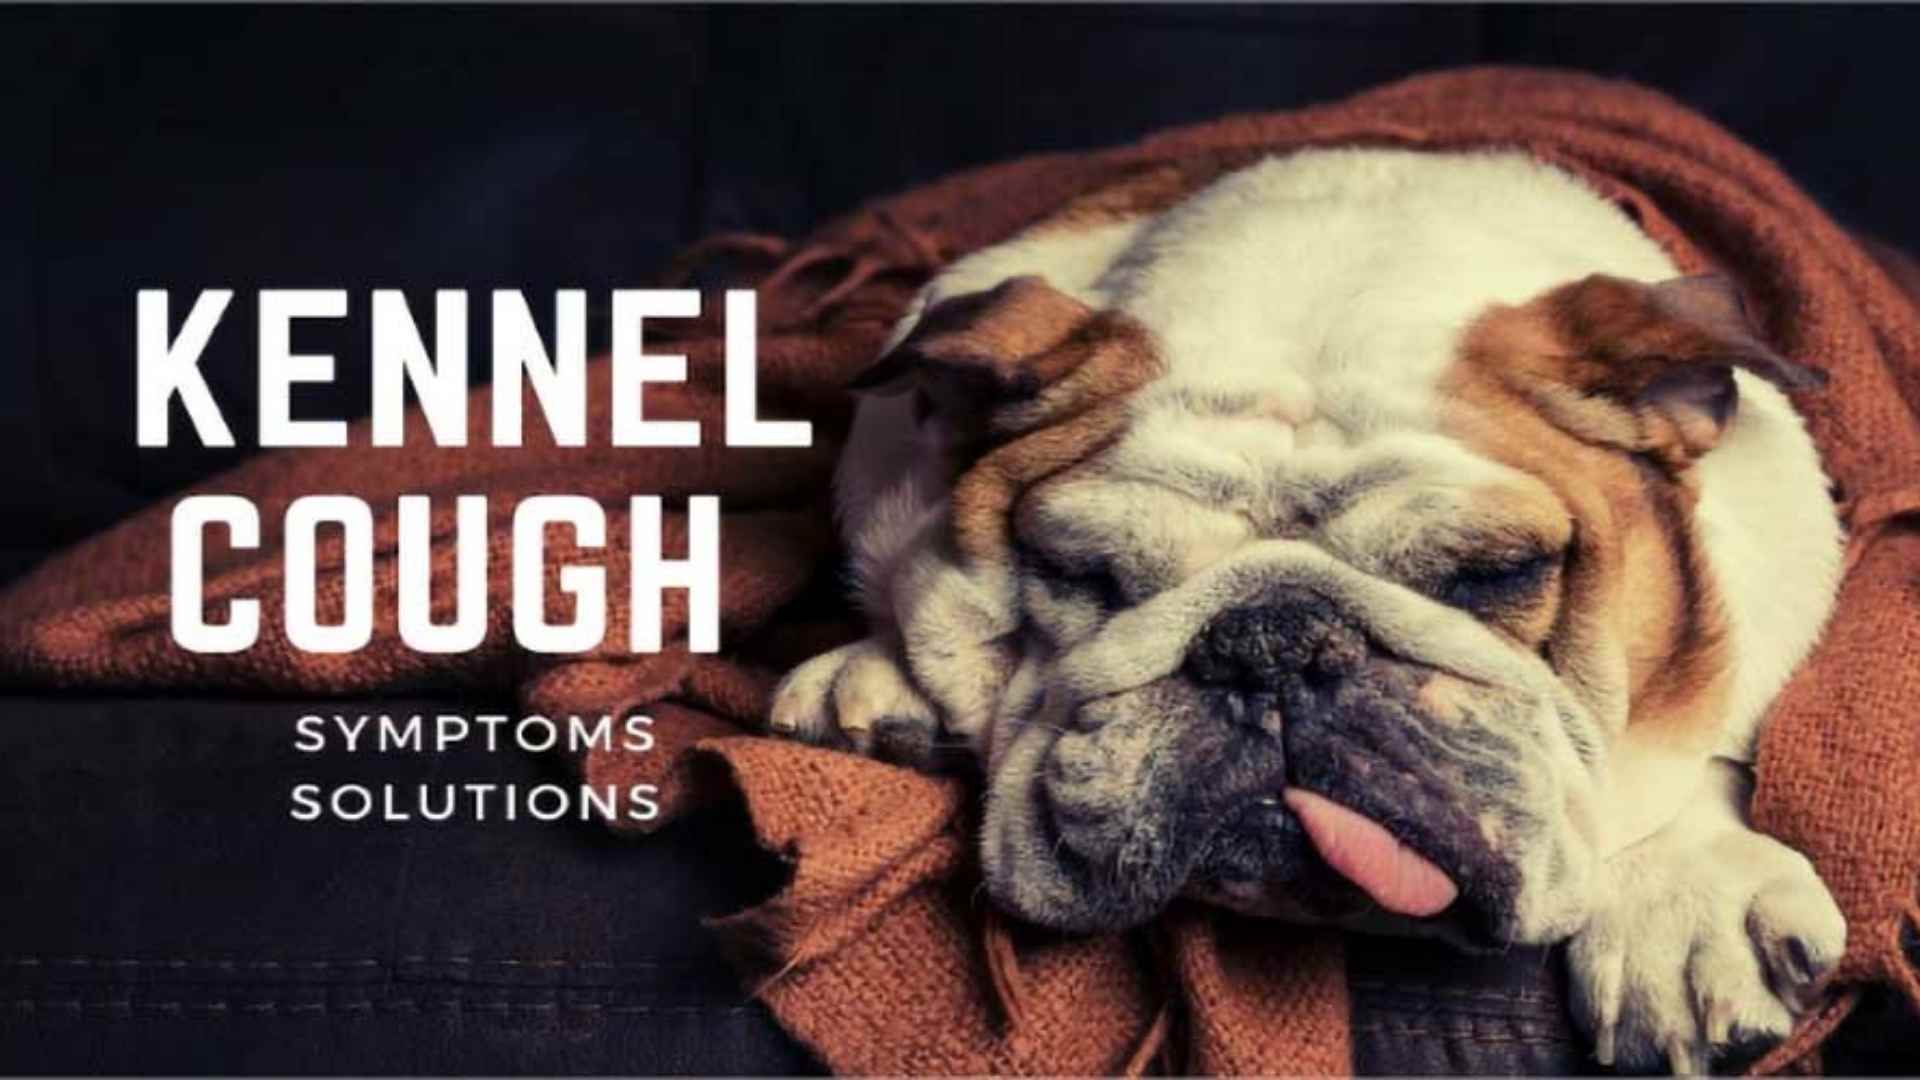 Kennel Cough: Symptoms & Solutions